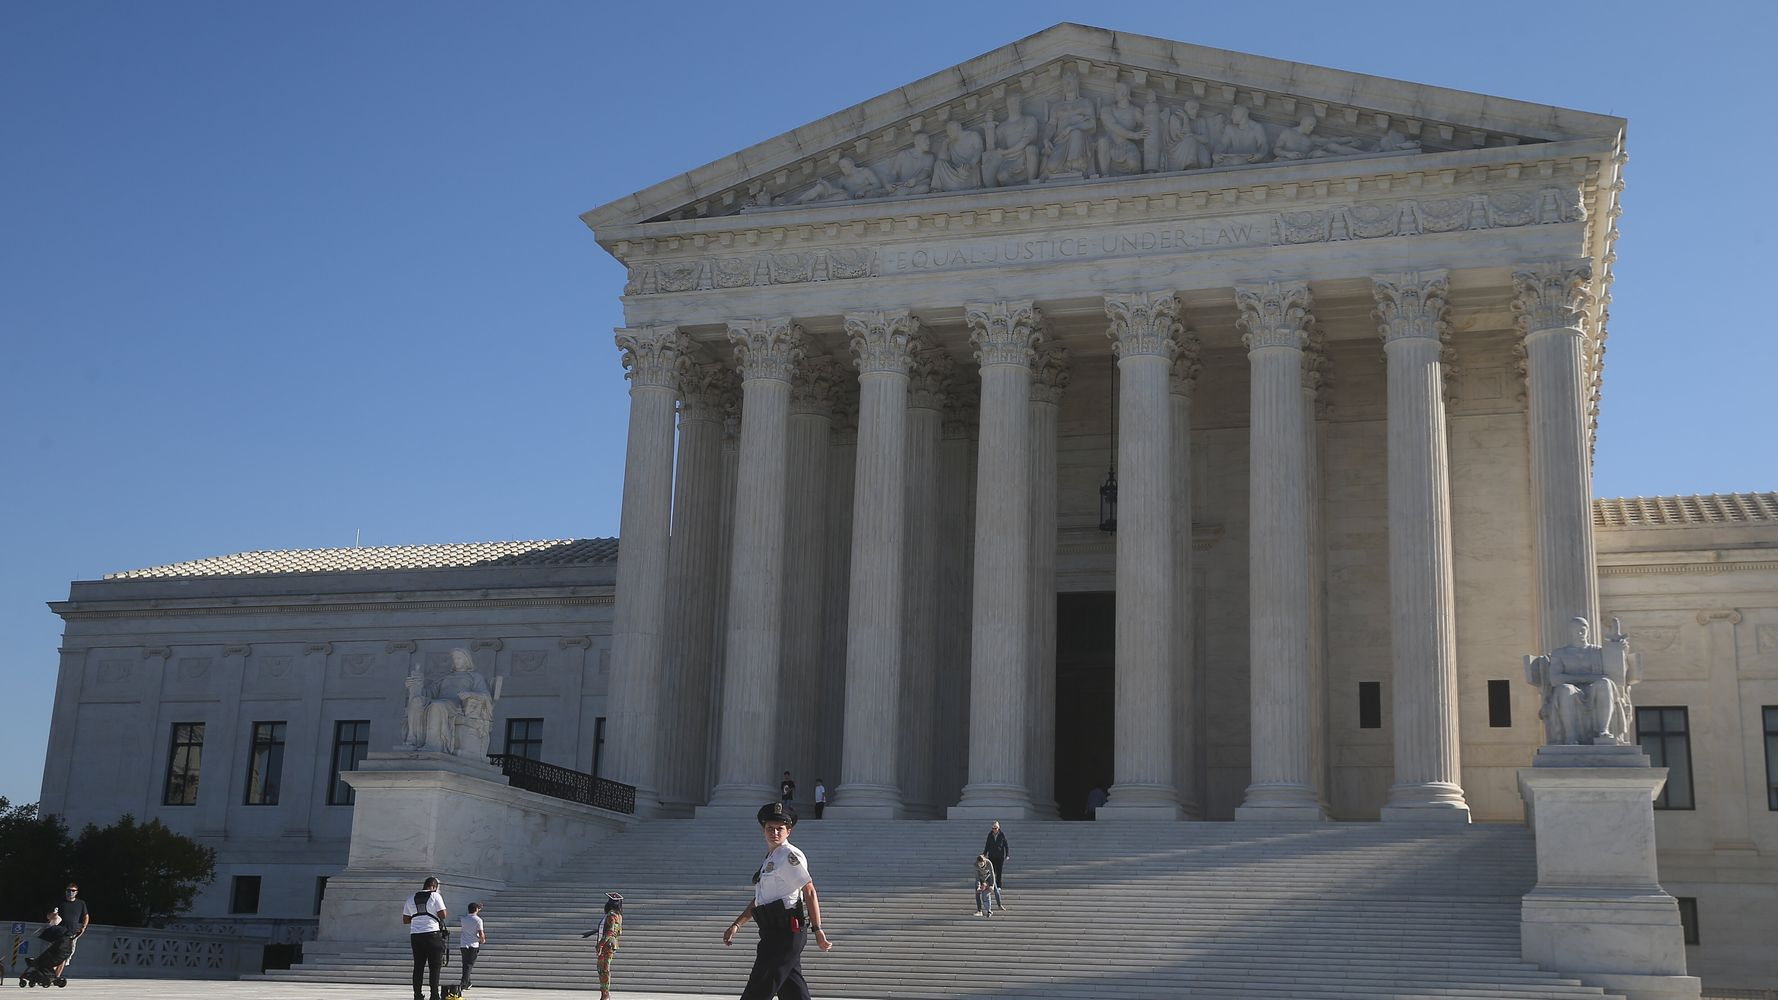 Obamacare Lawsuit Gets Skeptical Reception At The Supreme Court